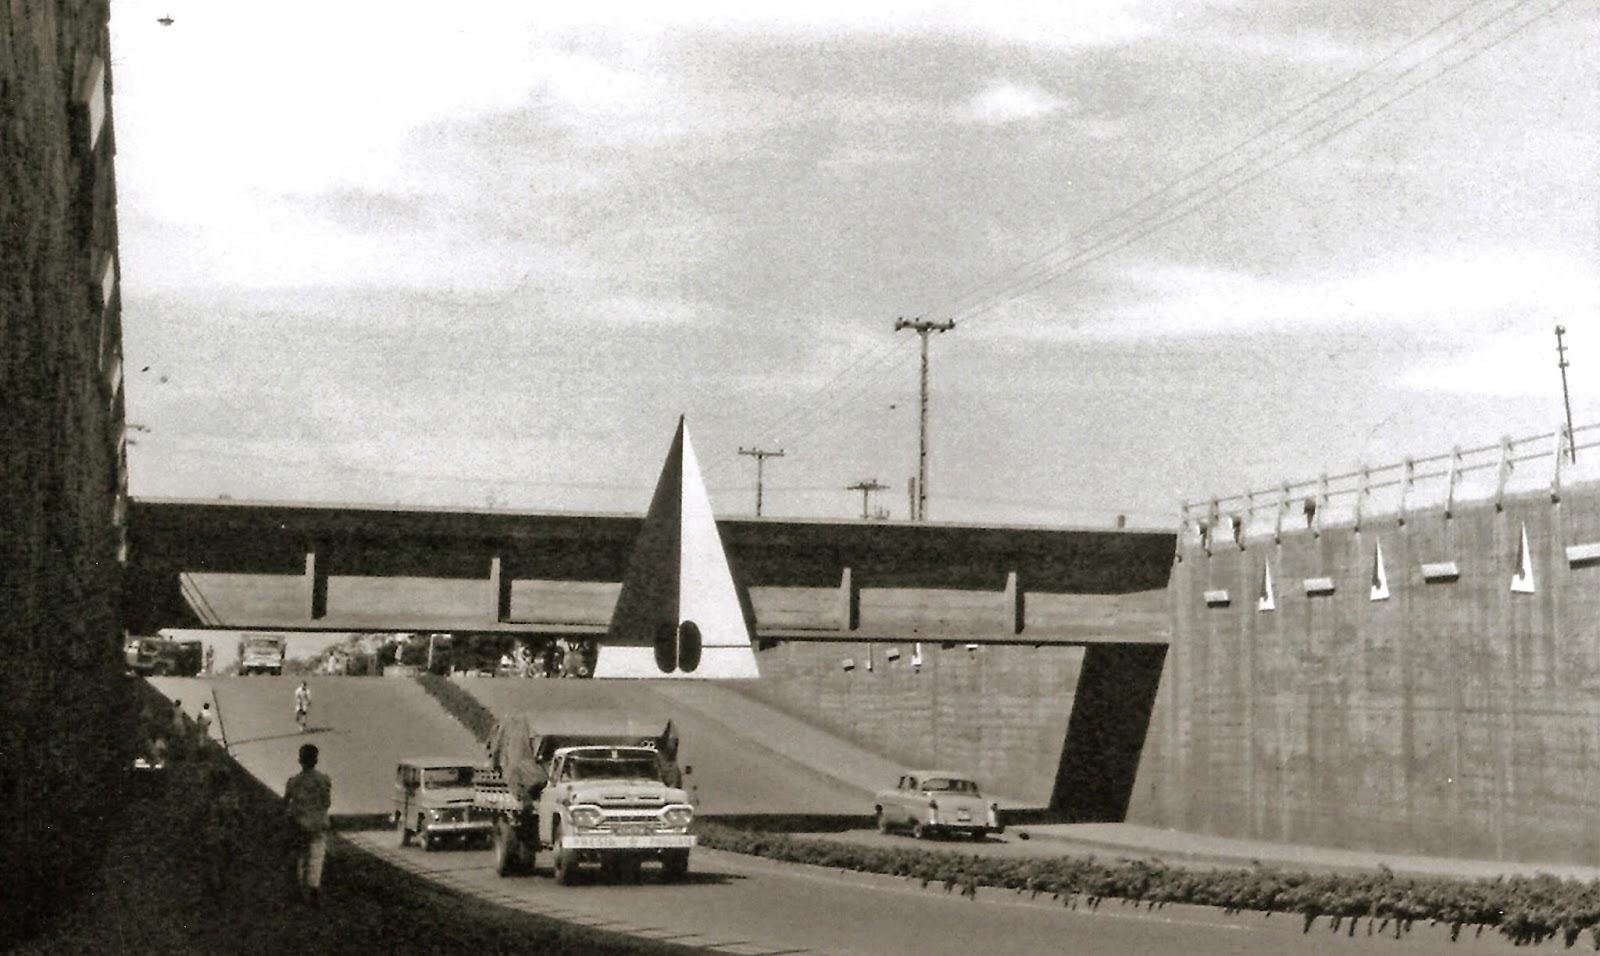 Viaduto do Café - 1967